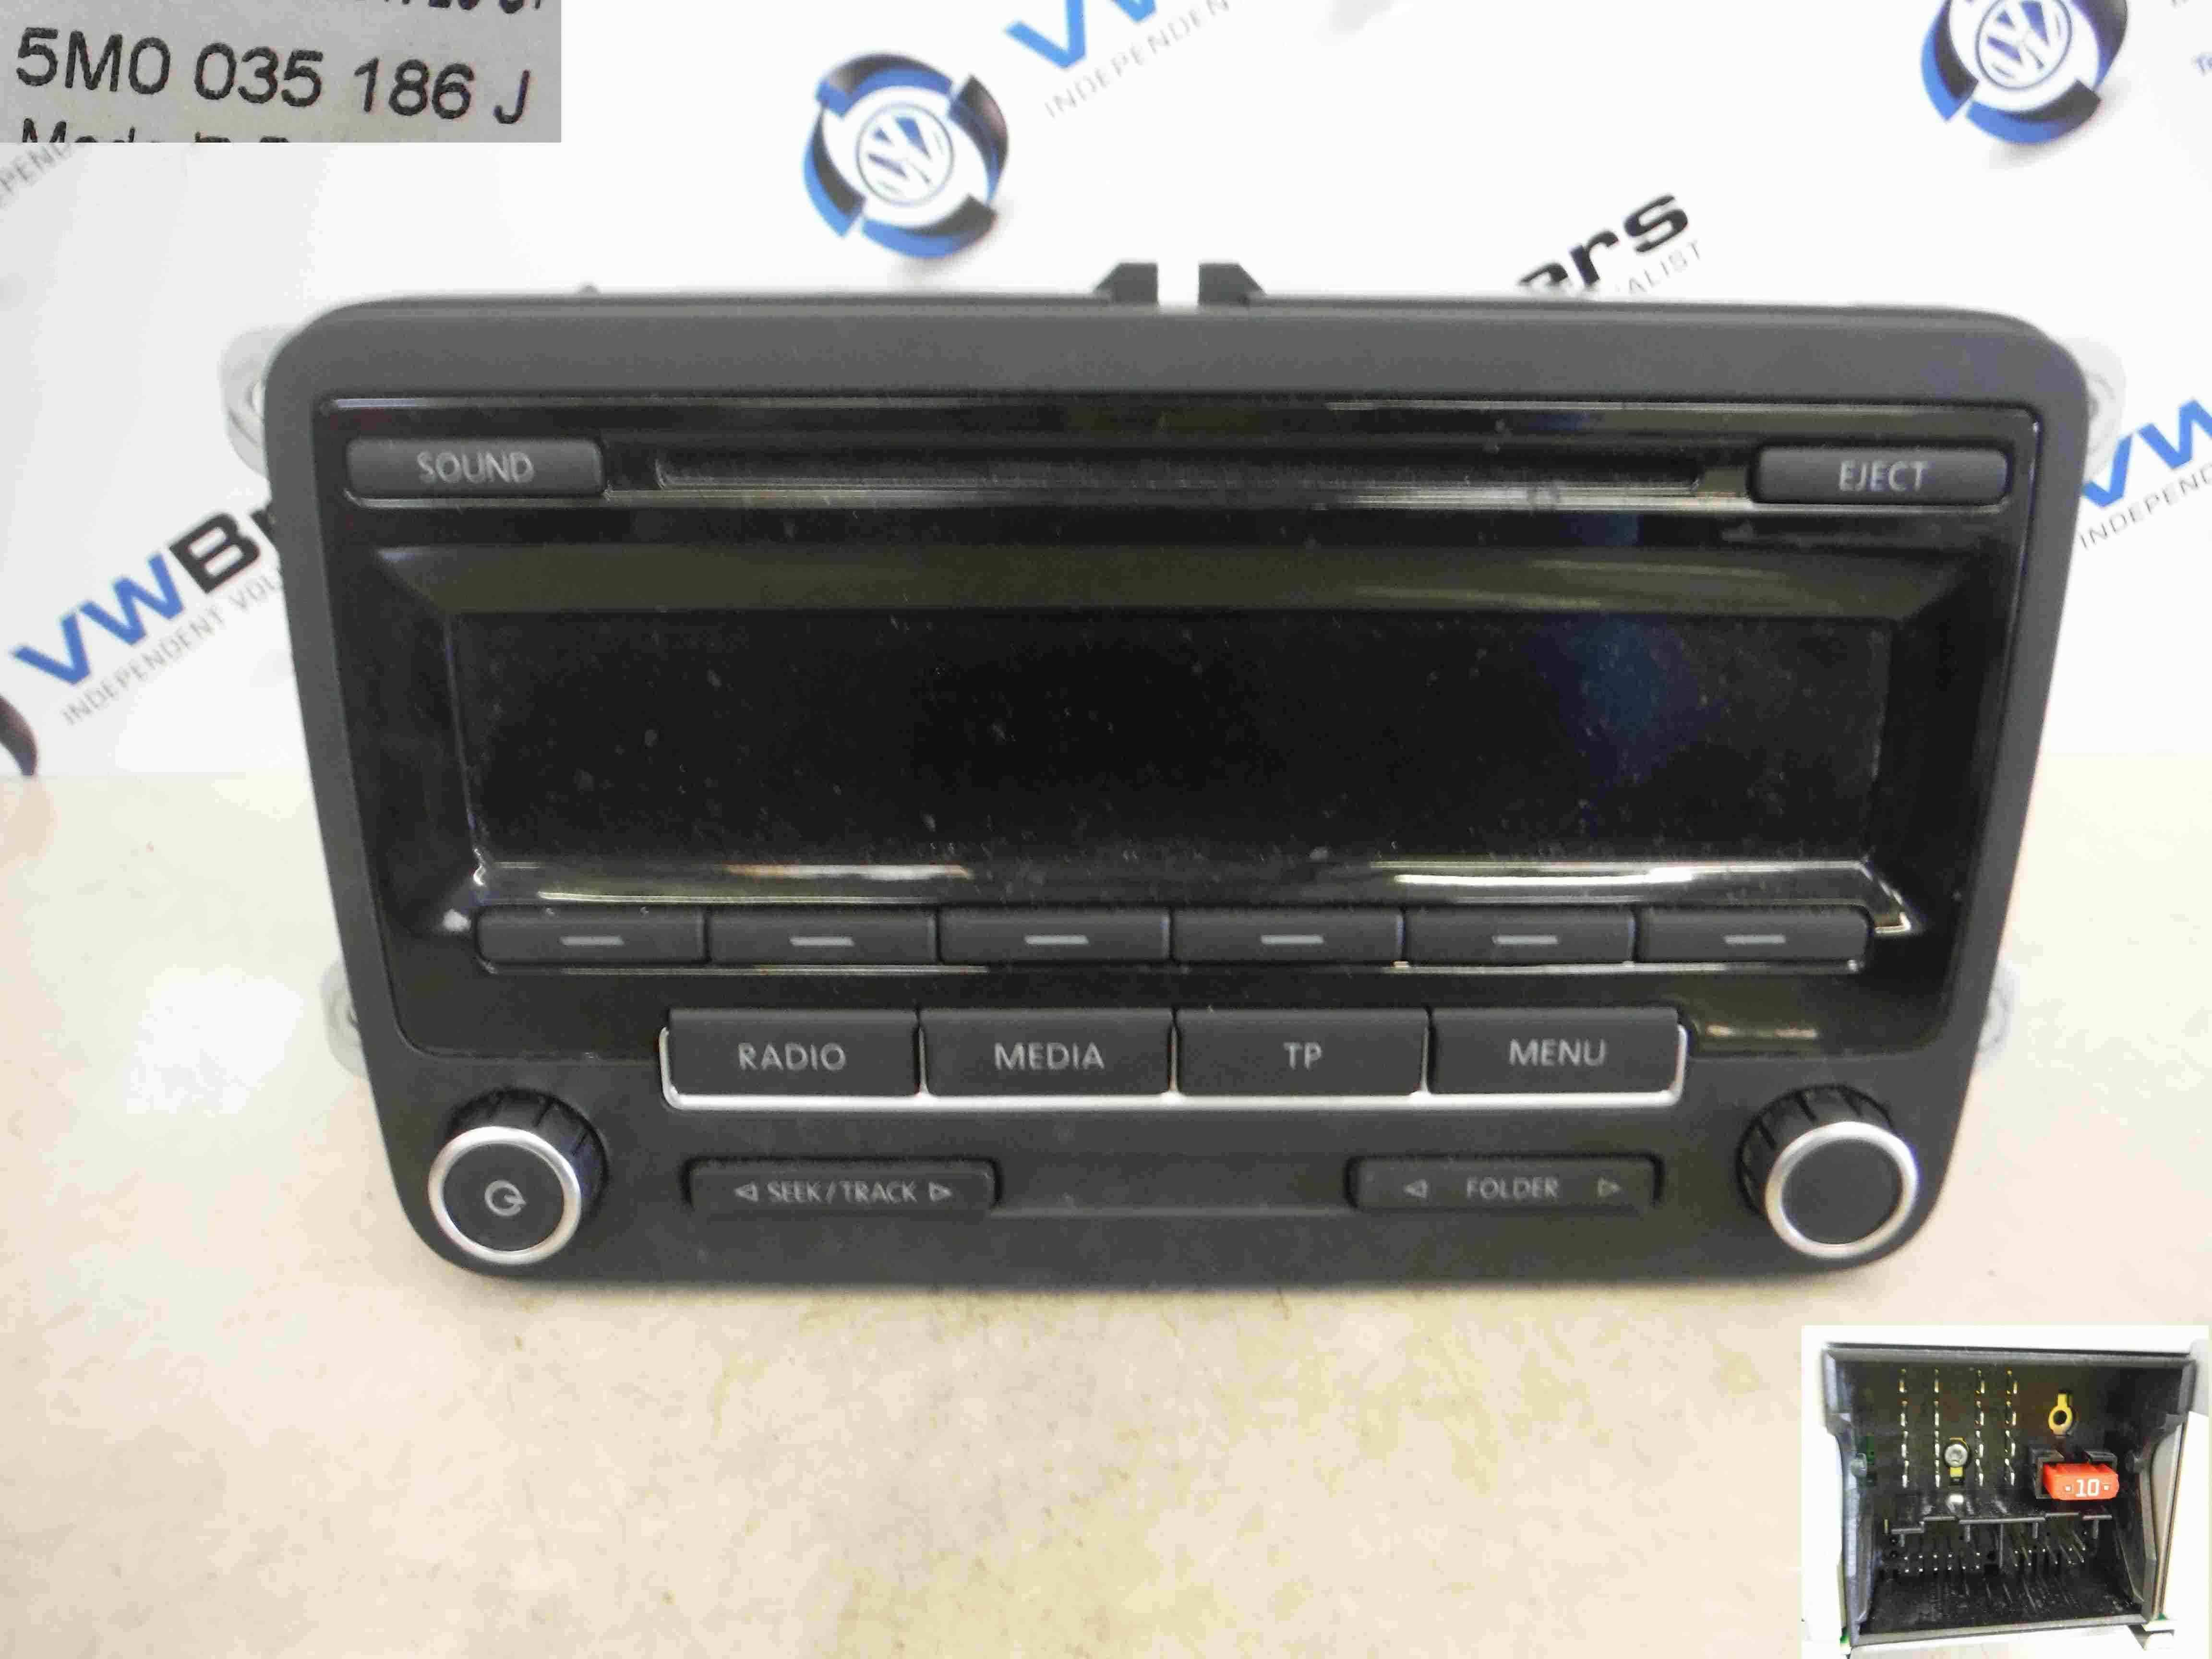 Volkswagen Polo 2009-2015 6R CD Player Radio Media Gloss Black 5M0035186J